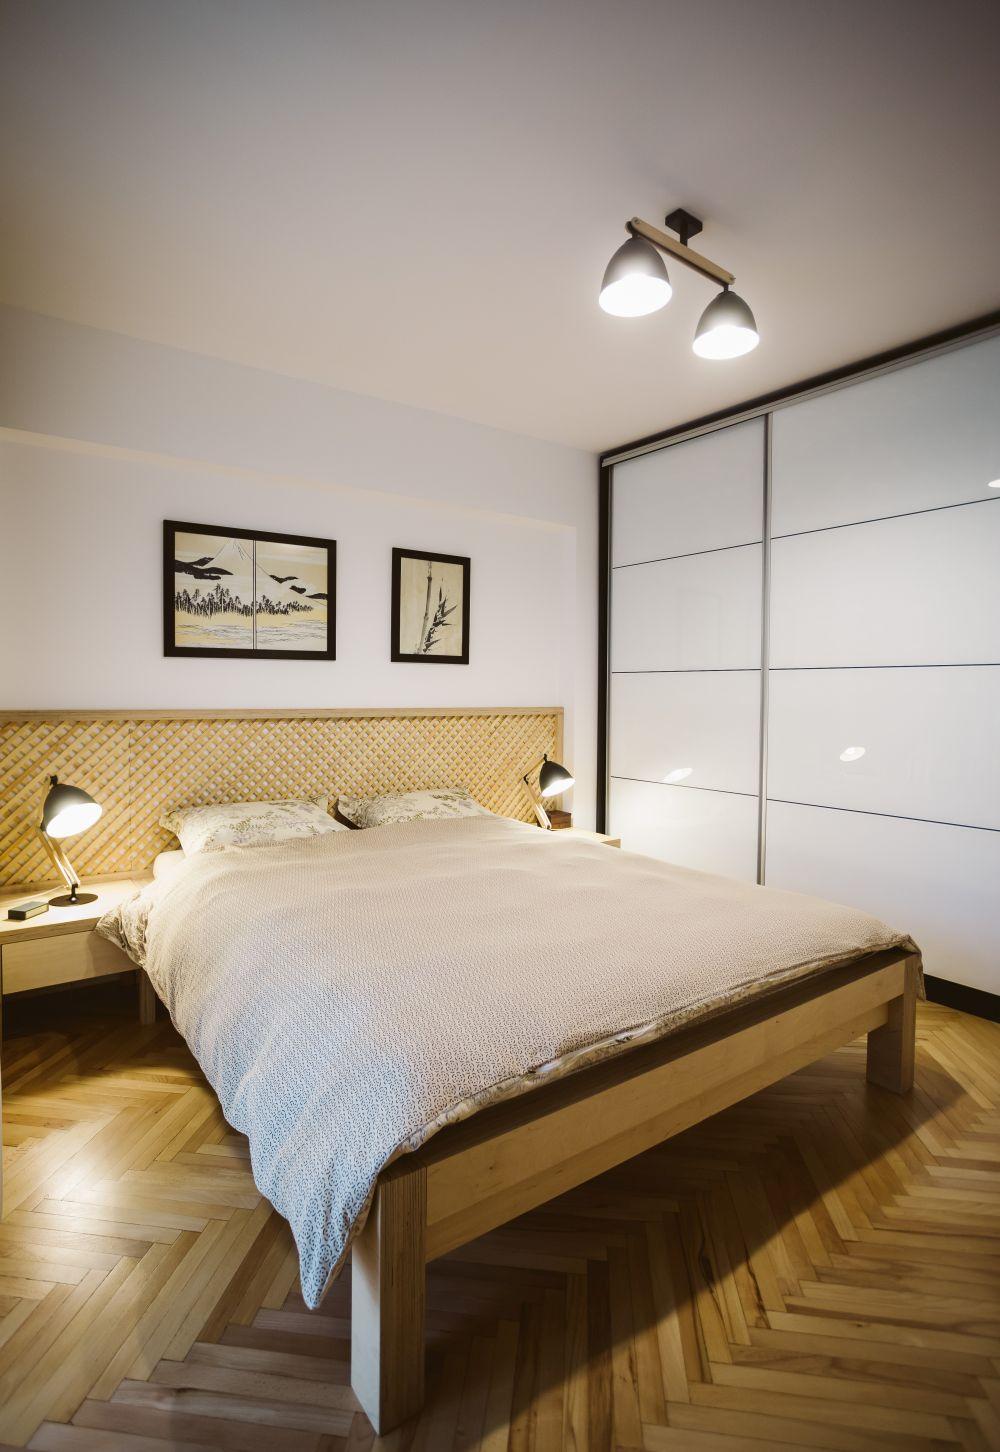 adelaparvu-com-despre-apartament-3-camere-bucuresti-reamenajat-designer-mihaela-cetanas-foto-cezar-buliga-22